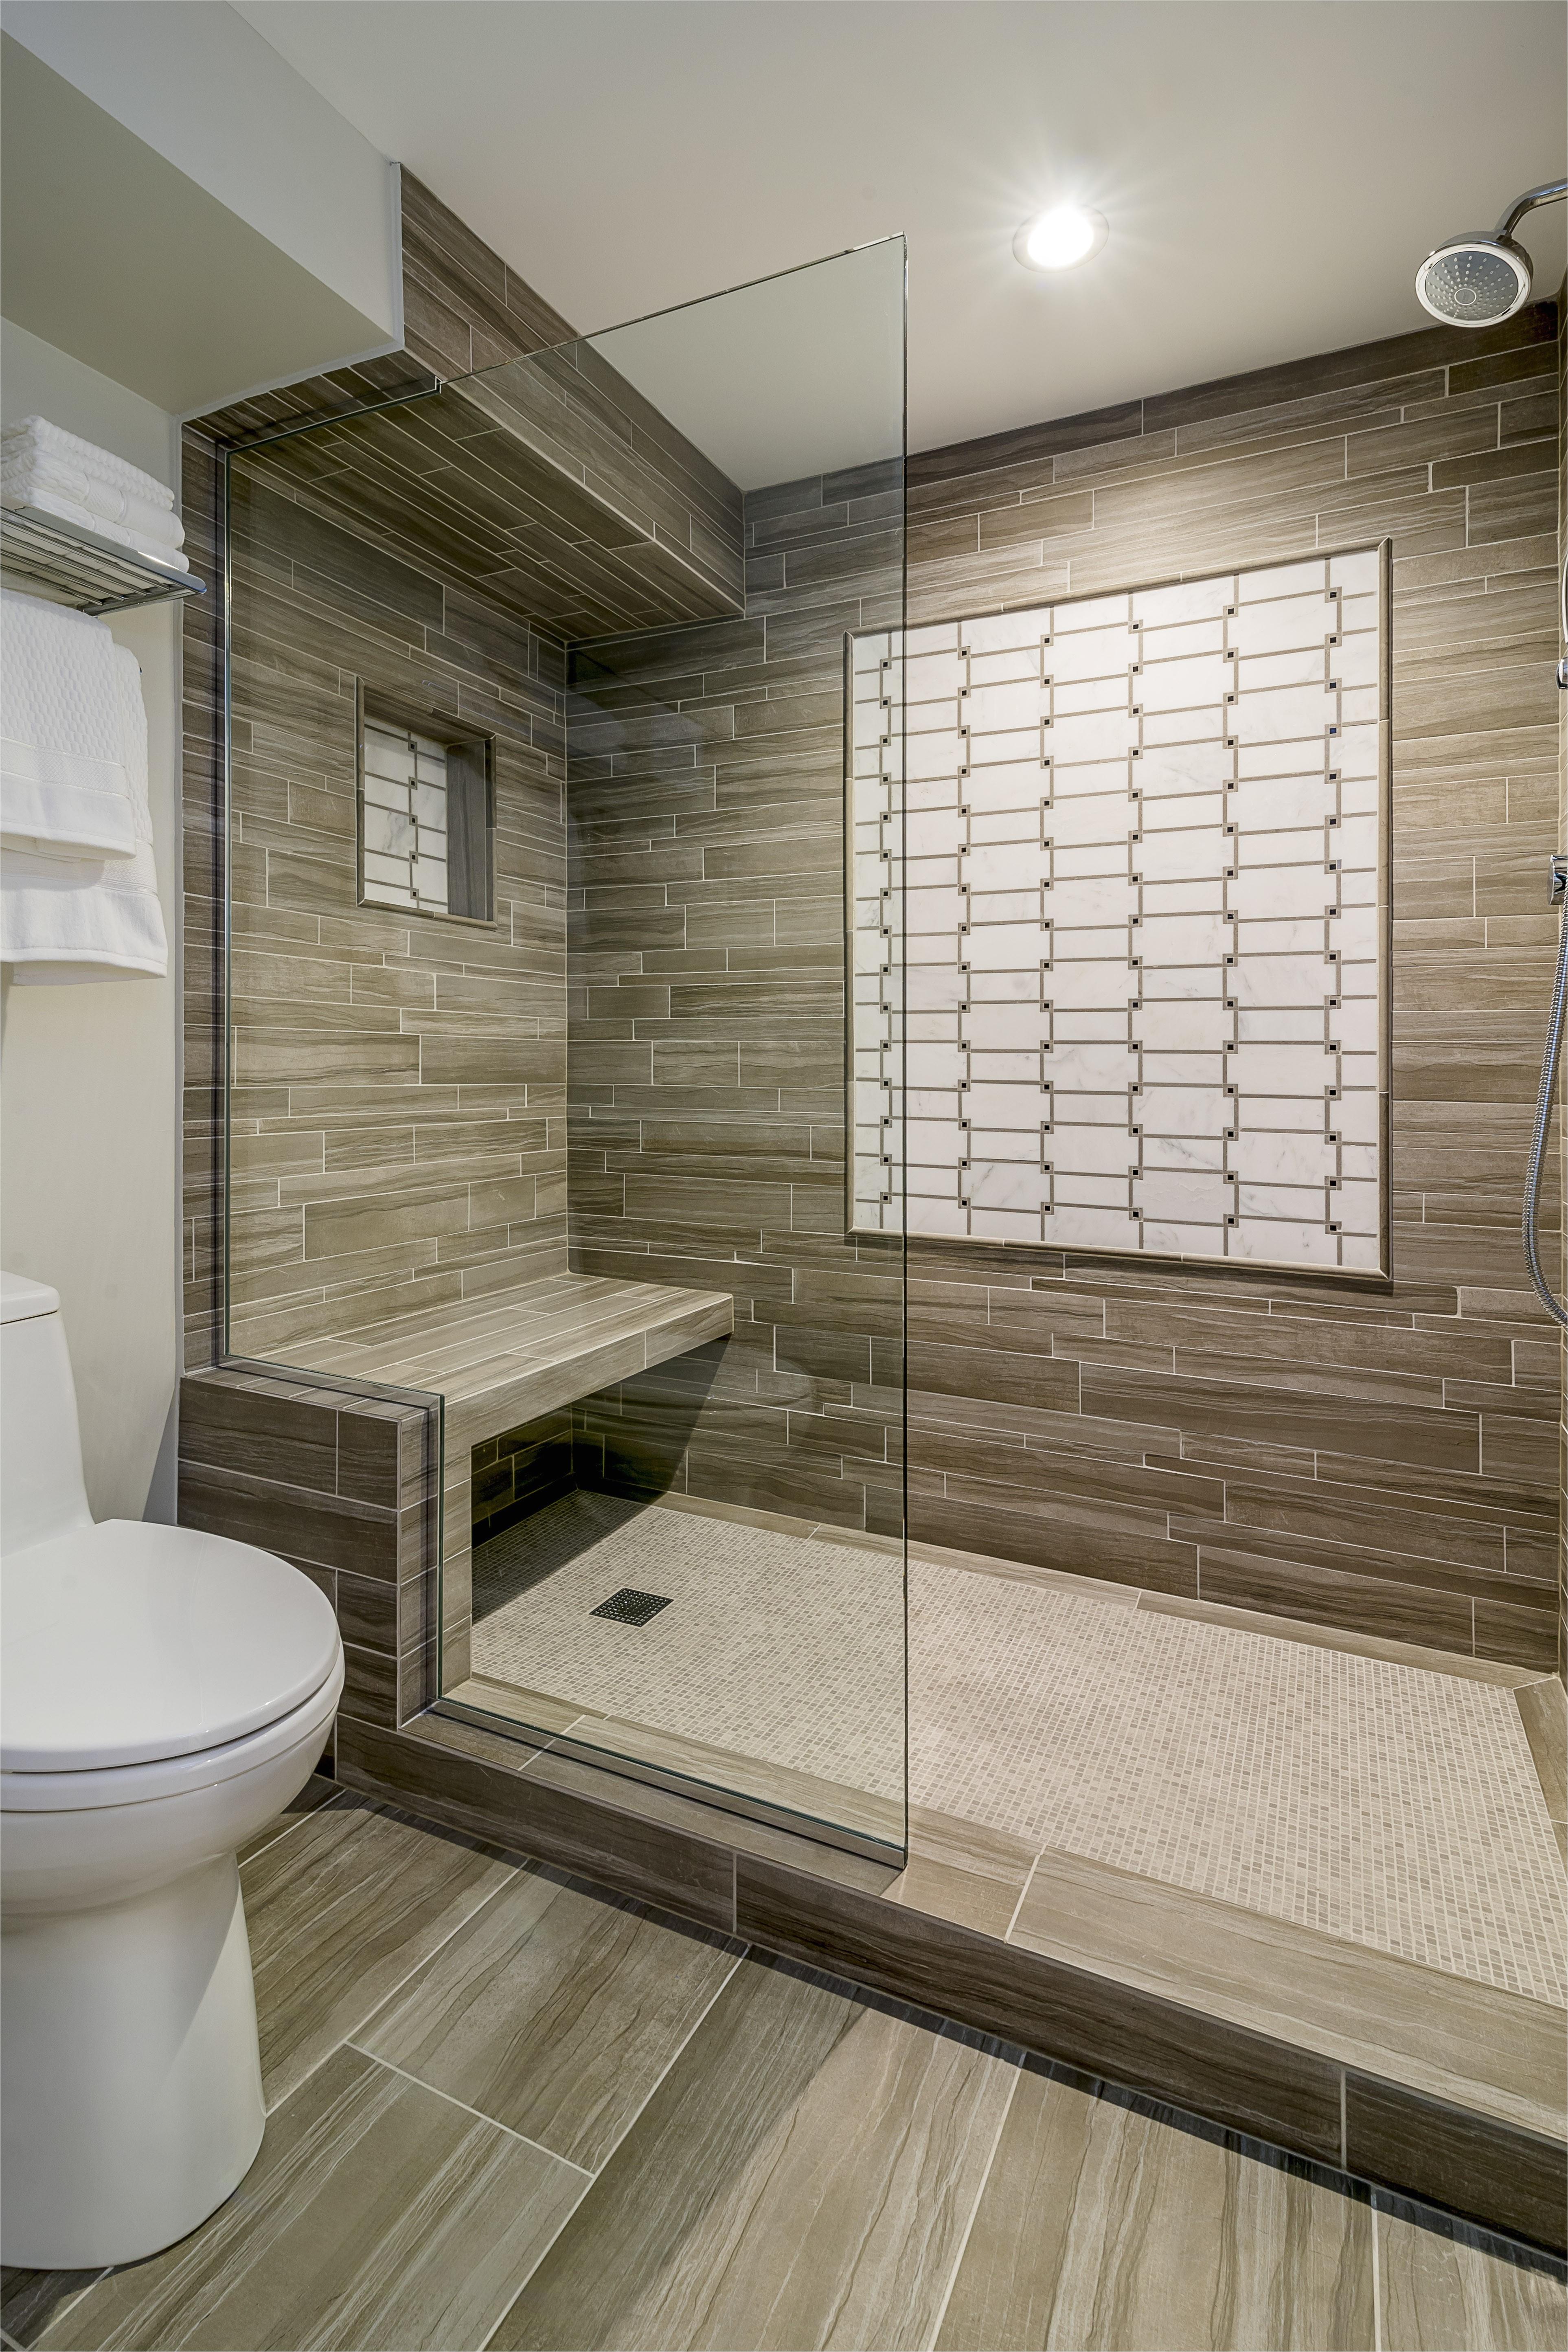 Bathroom s for Small Bathrooms